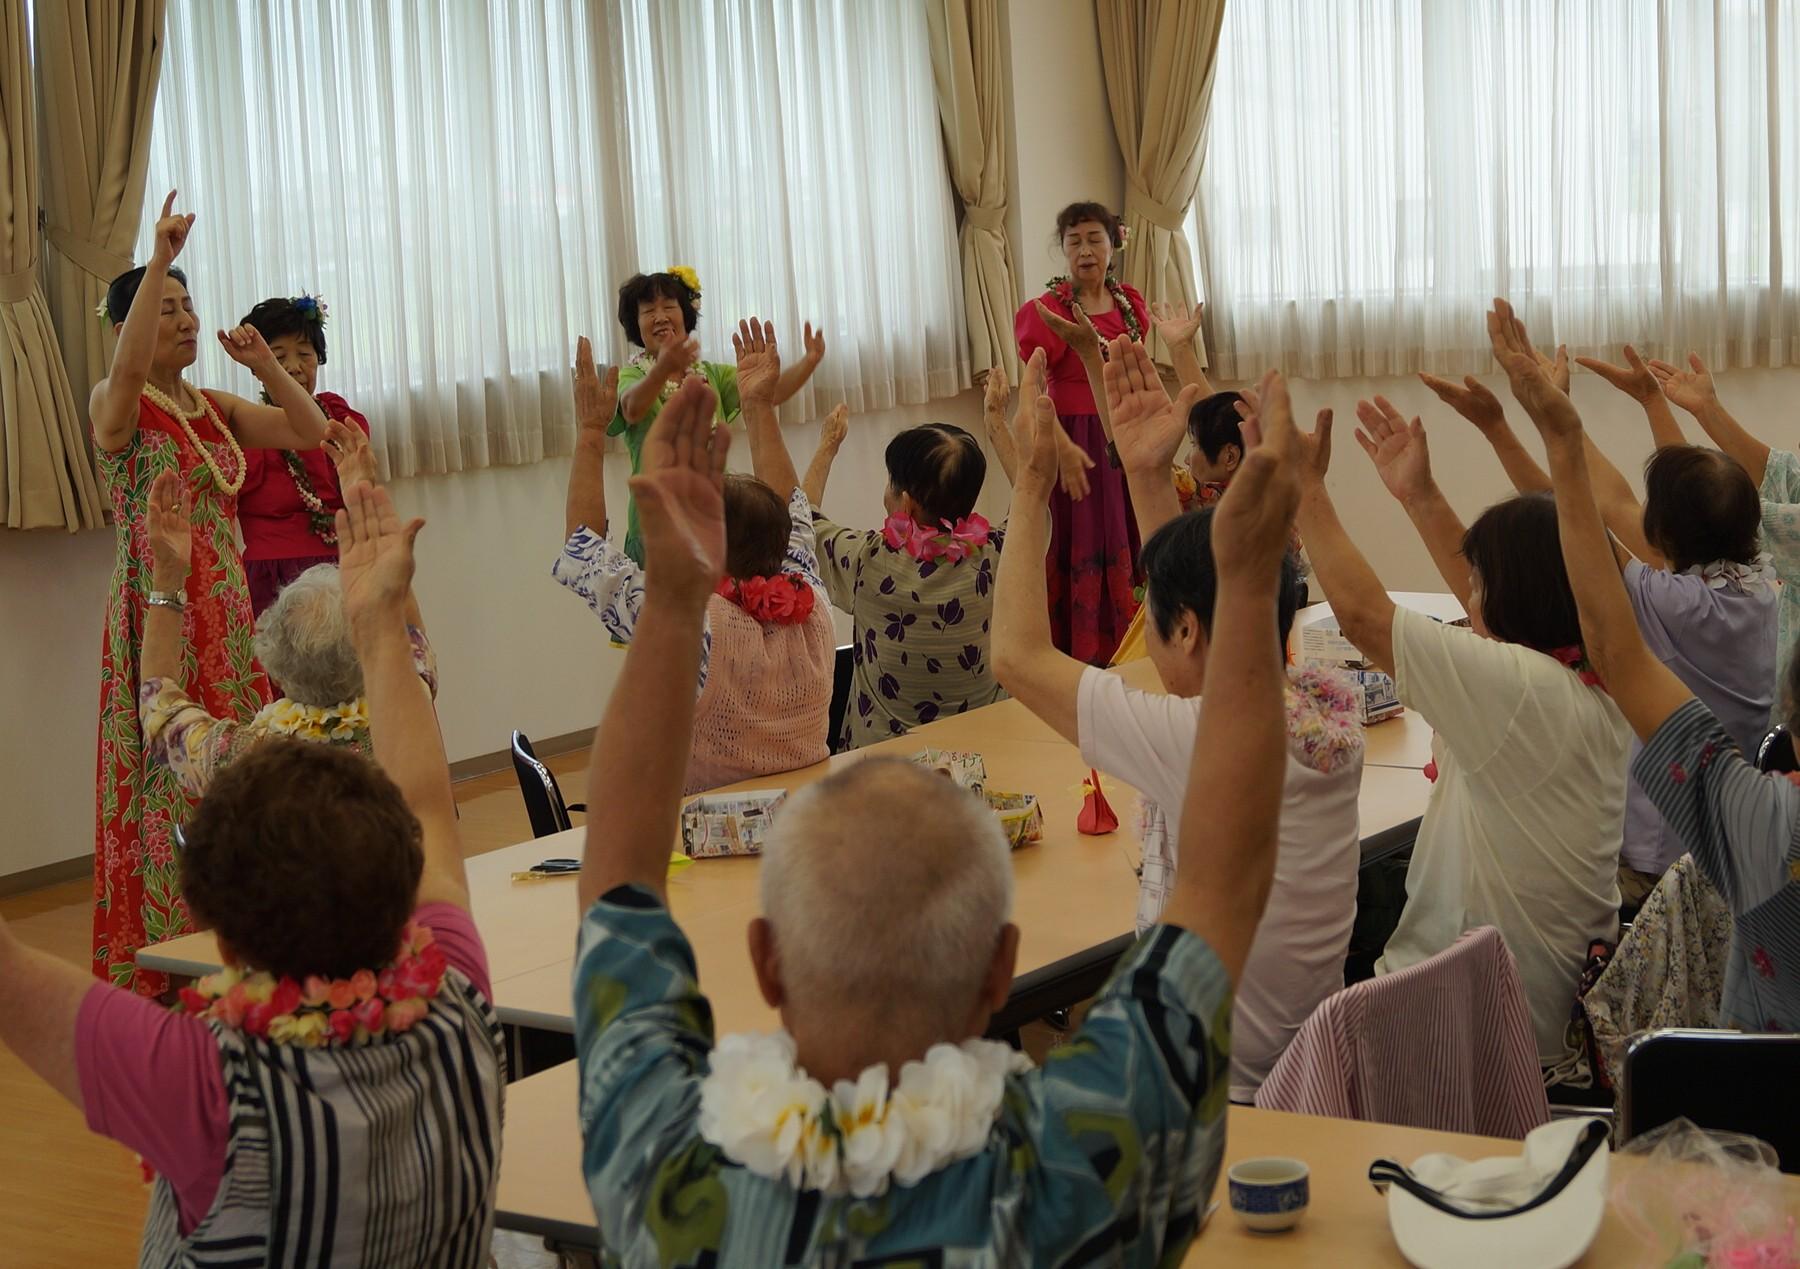 JA 海部東農業協同組合(あまひがし) -なの花の会 フラダンスで気分は南国